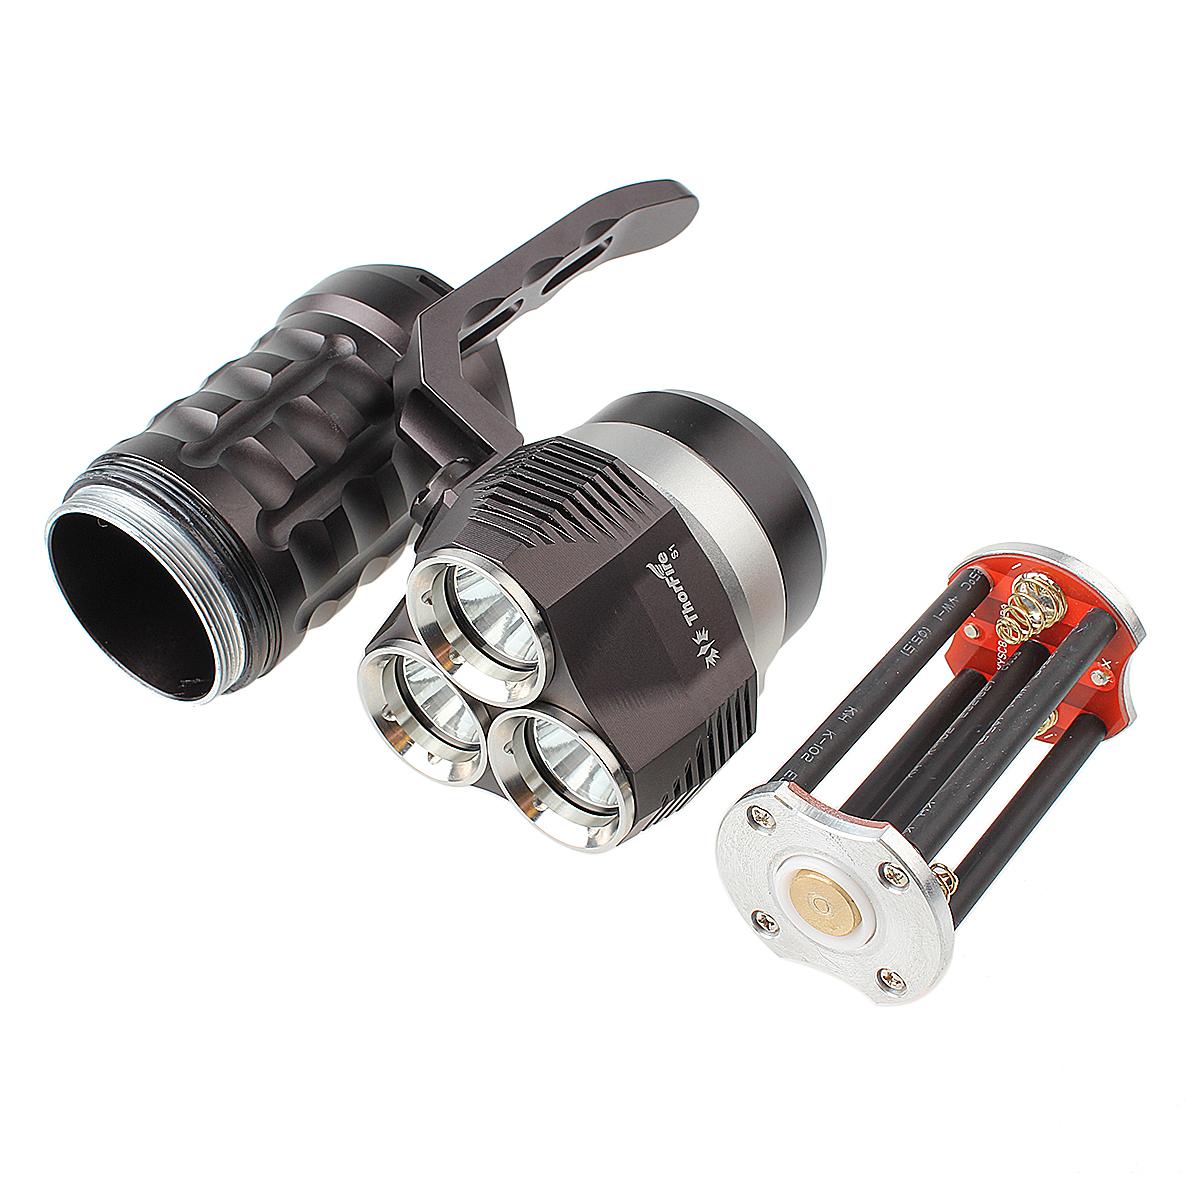 ThorFire S1 3x L2 LED Diving Flashlight 3 modes Searchlight